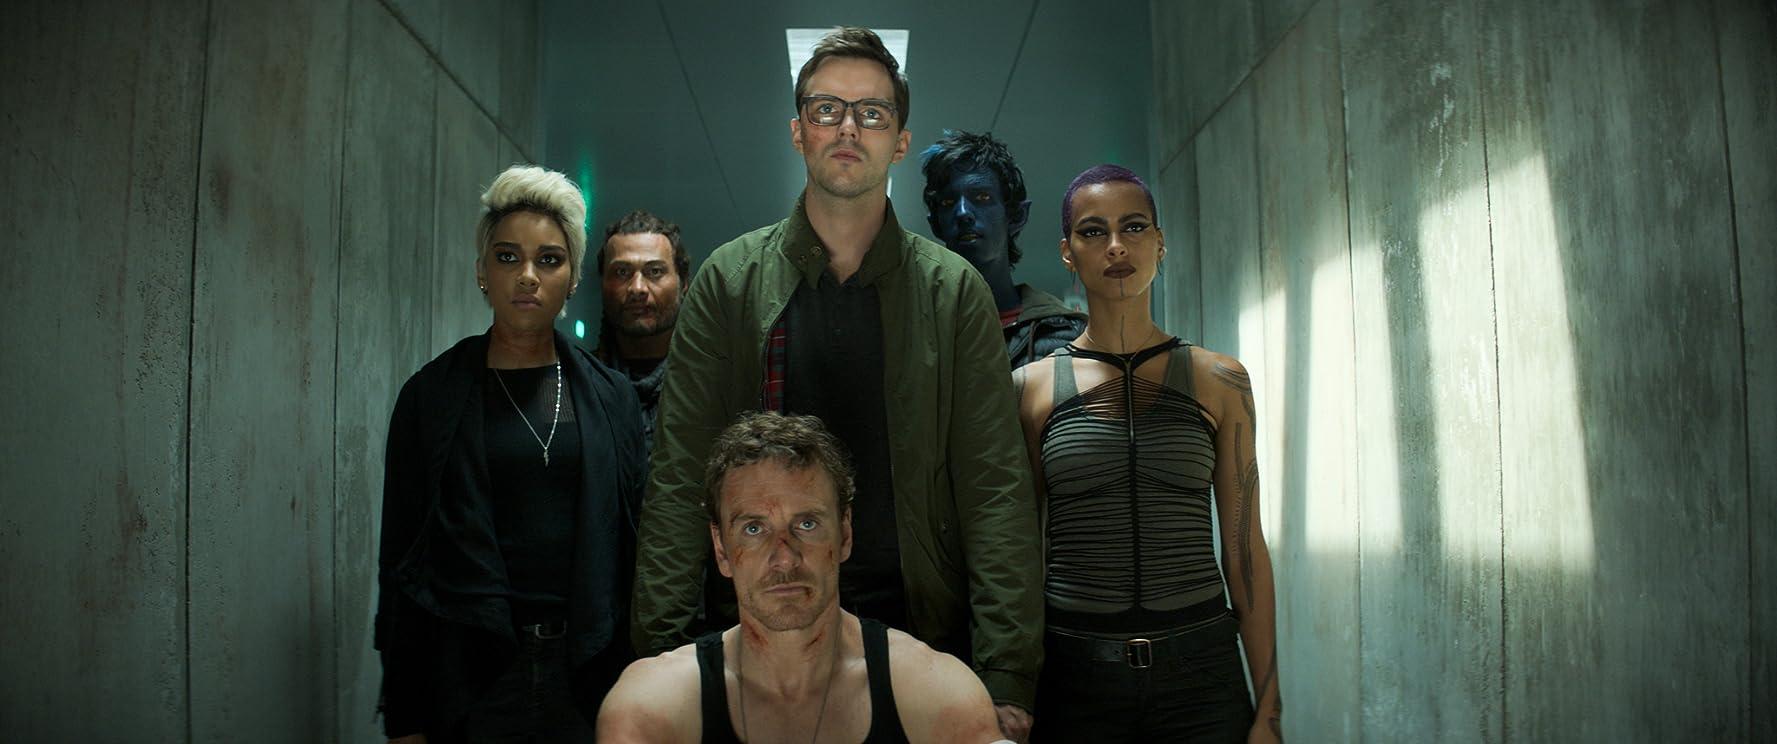 Nicholas Hoult, Michael Fassbender, Andrew Stehlin, Kodi Smit-McPhee, Alexandra Shipp, and Kota Eberhardt in Dark Phoenix (2019)